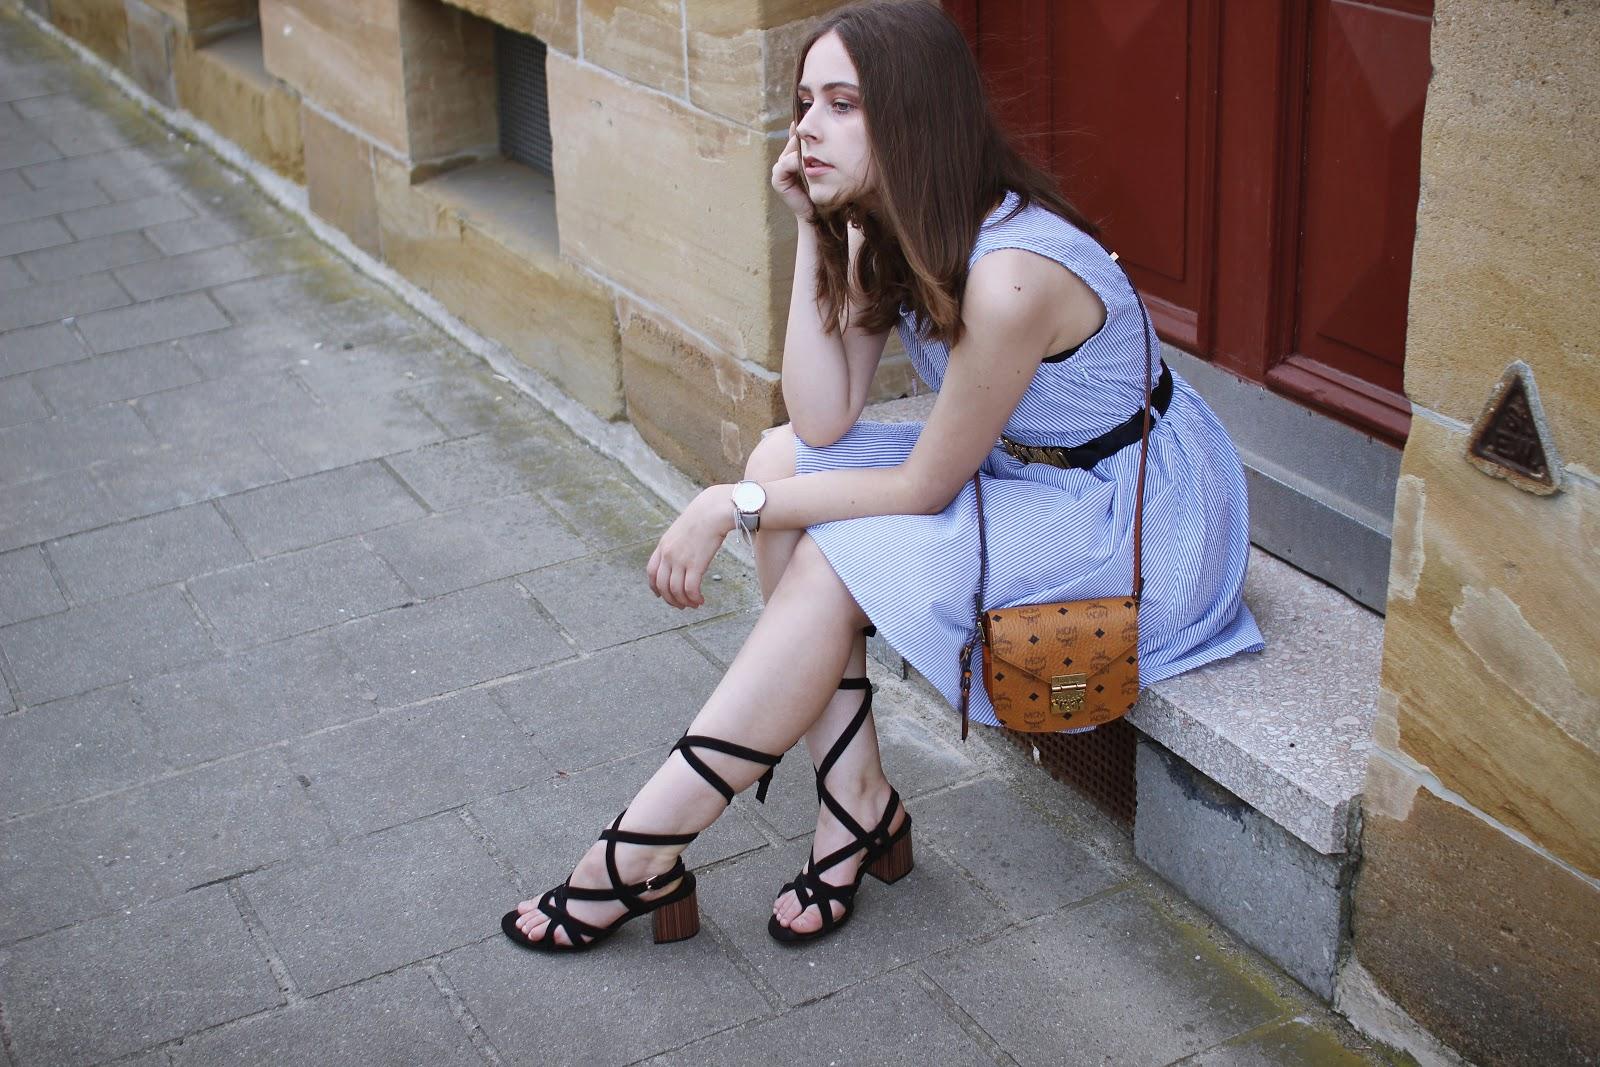 outfit blau weiss gestreiftes kleidchen lace sandals. Black Bedroom Furniture Sets. Home Design Ideas